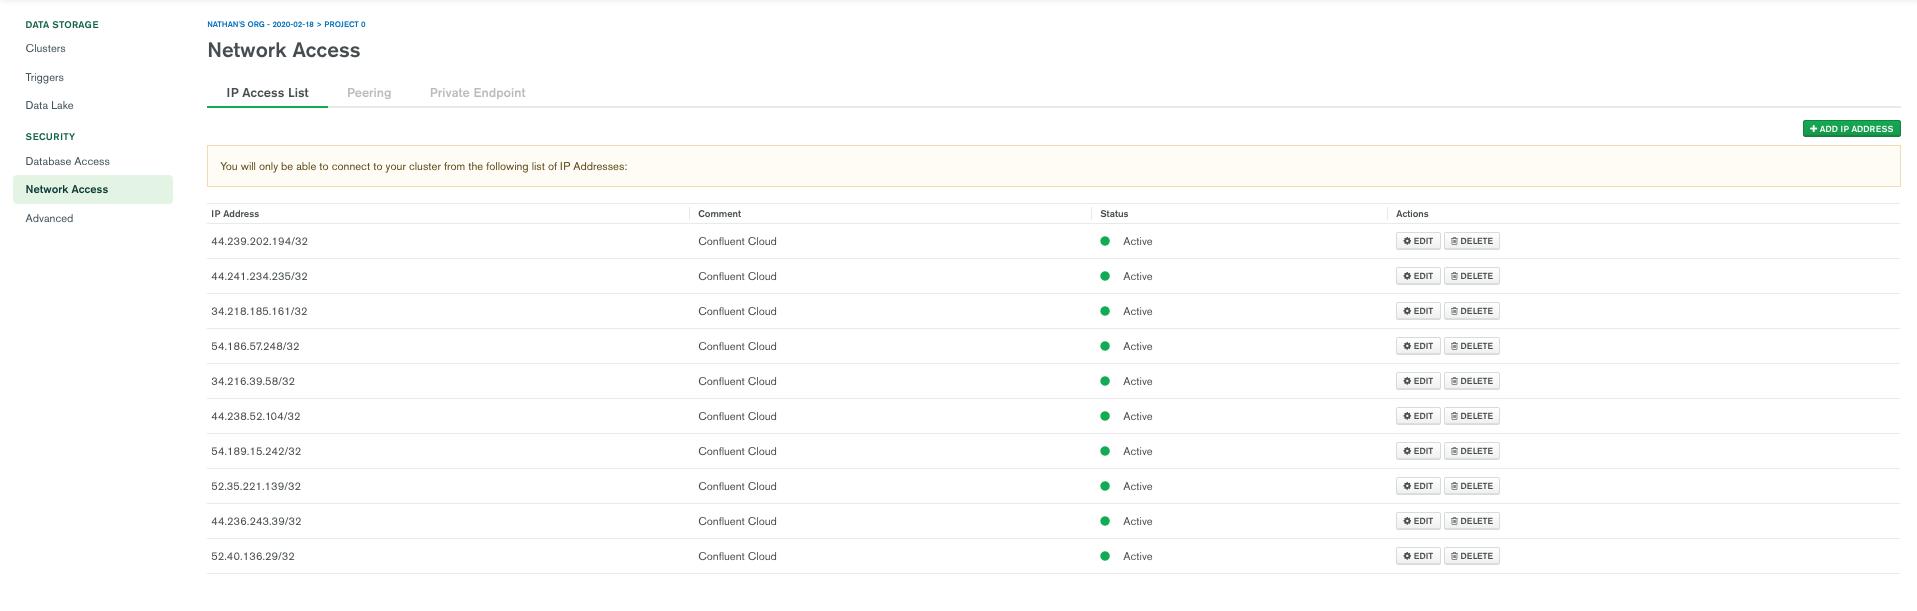 MongoDB Atlas network access page